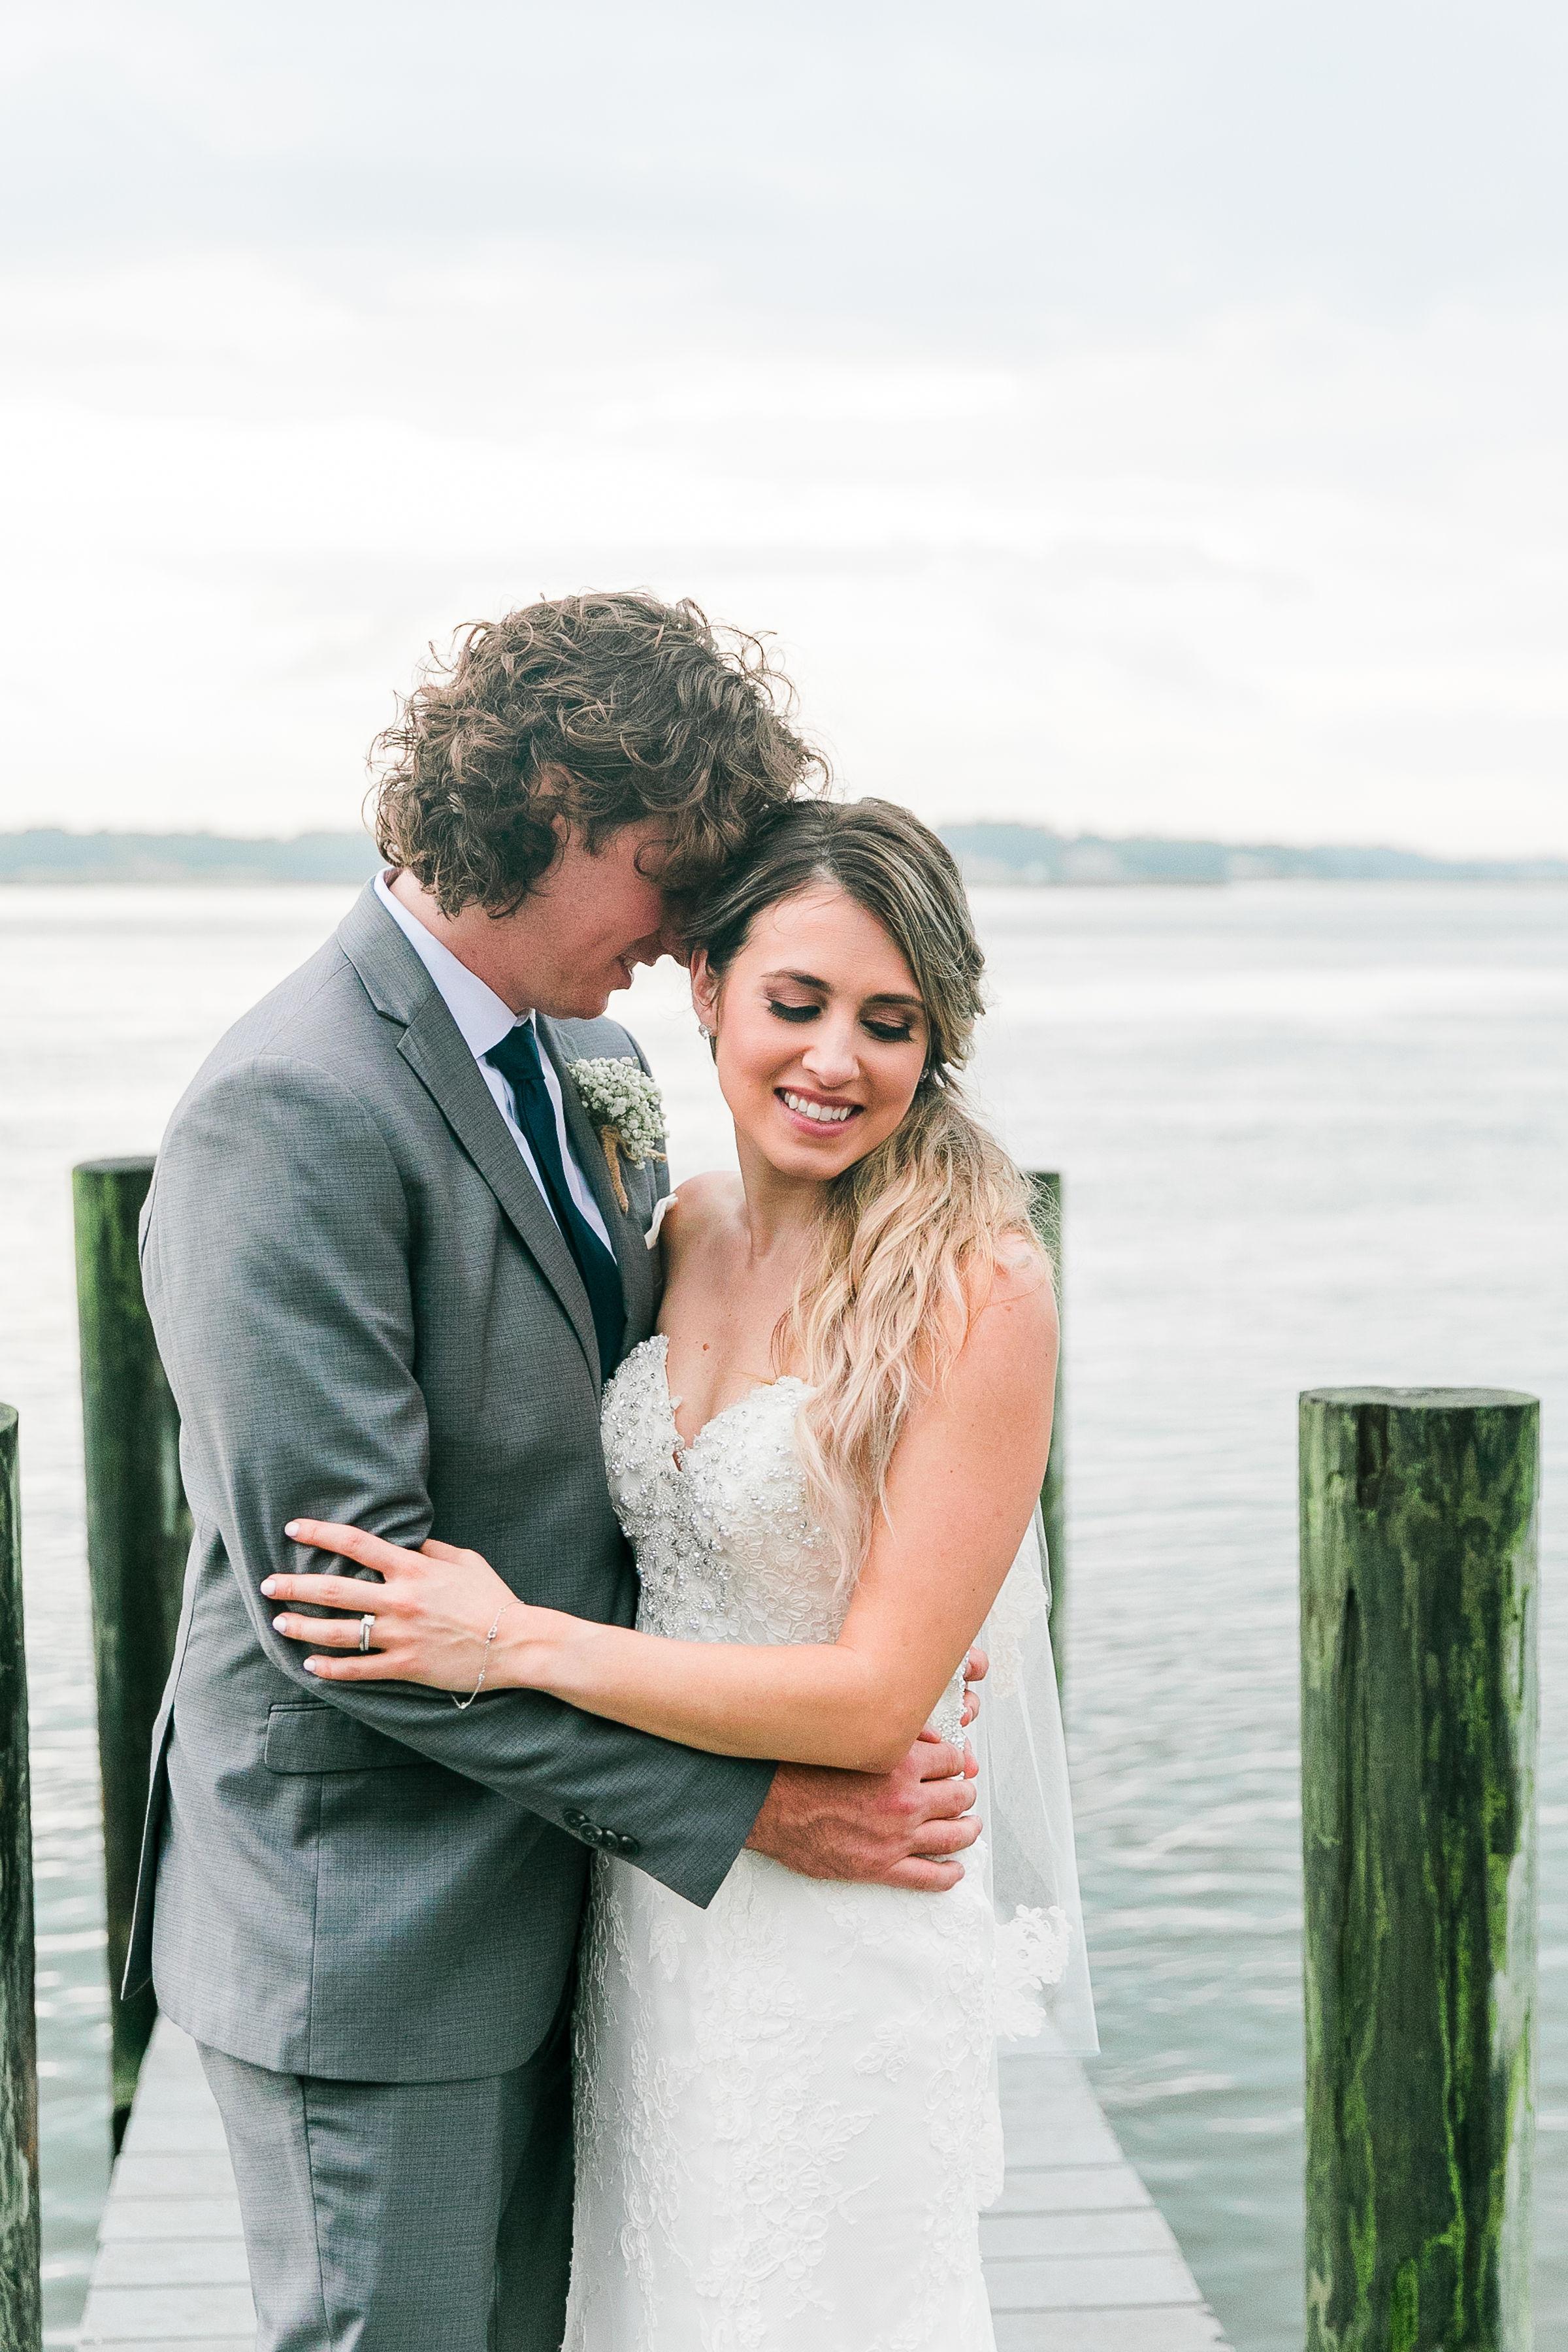 Nicole&Bryce_Bride&GroomPortraits-14.jpg